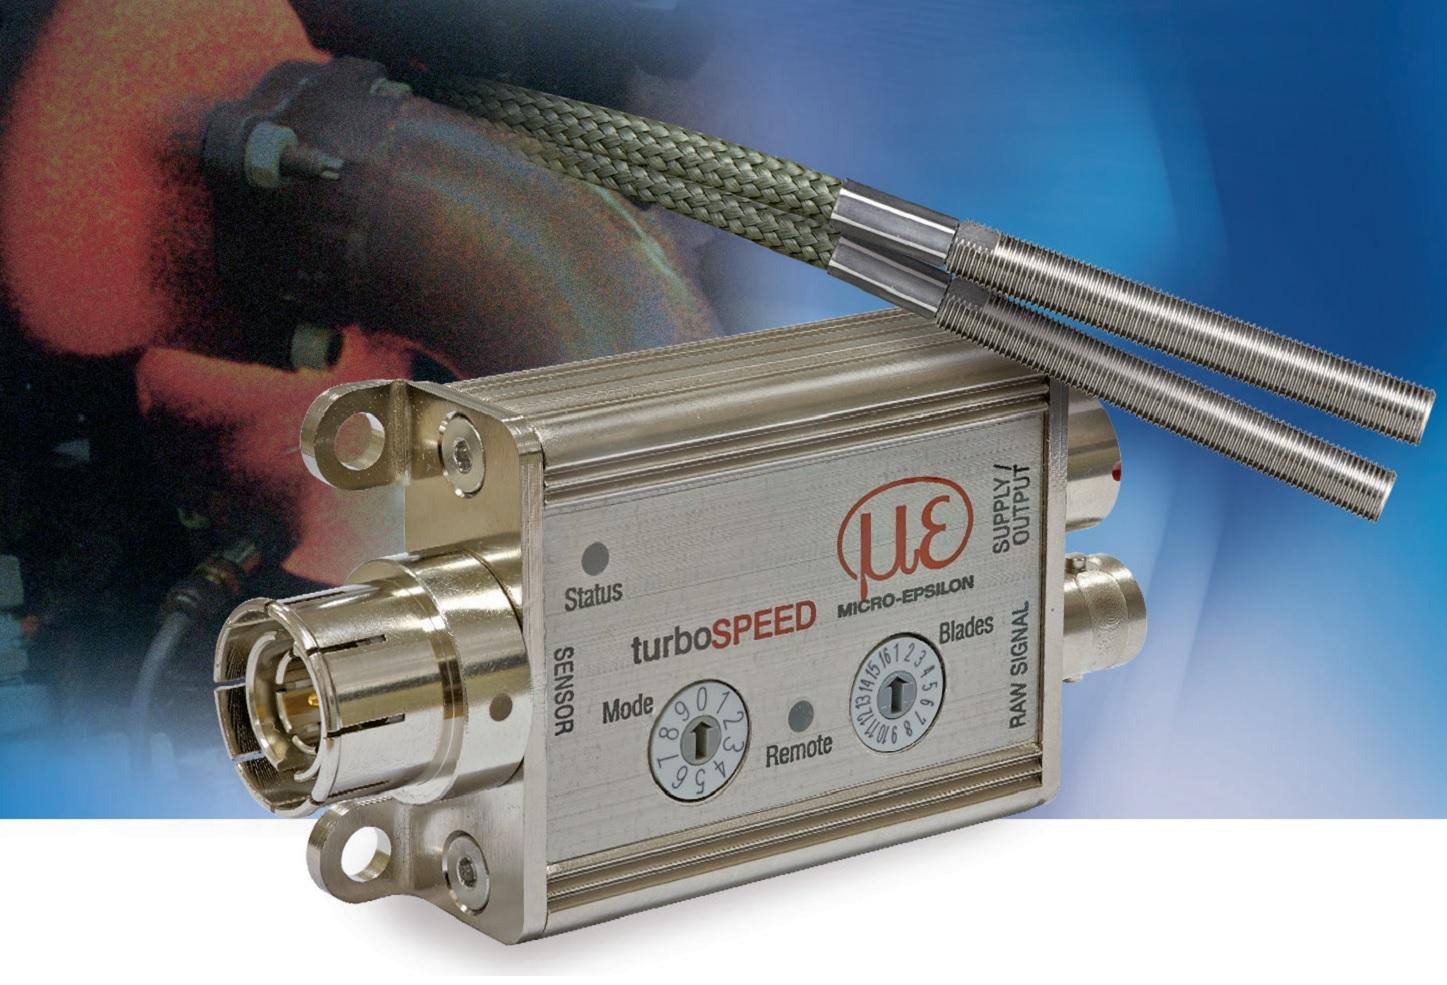 micro-epsilon  DZ140 电涡流位移传感器涡轮增压器测速系统